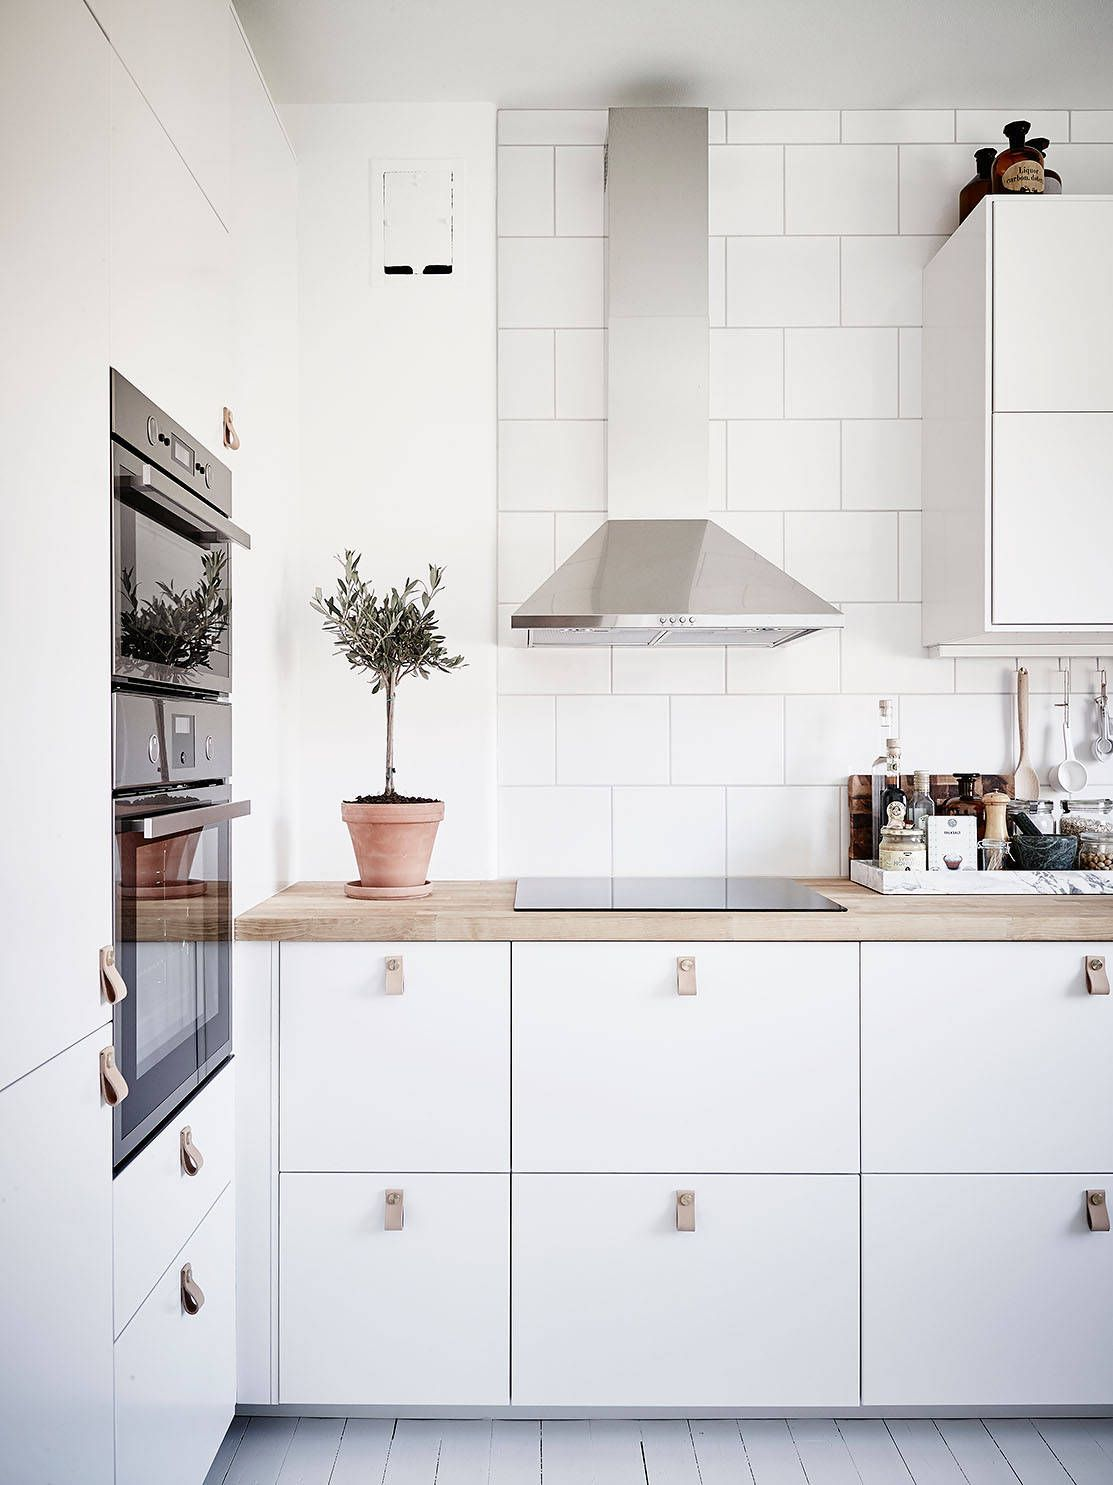 scandinavian white kitchen Scandinavian minimalist, white kitchen with wood countertops - Top 10 tips for adding